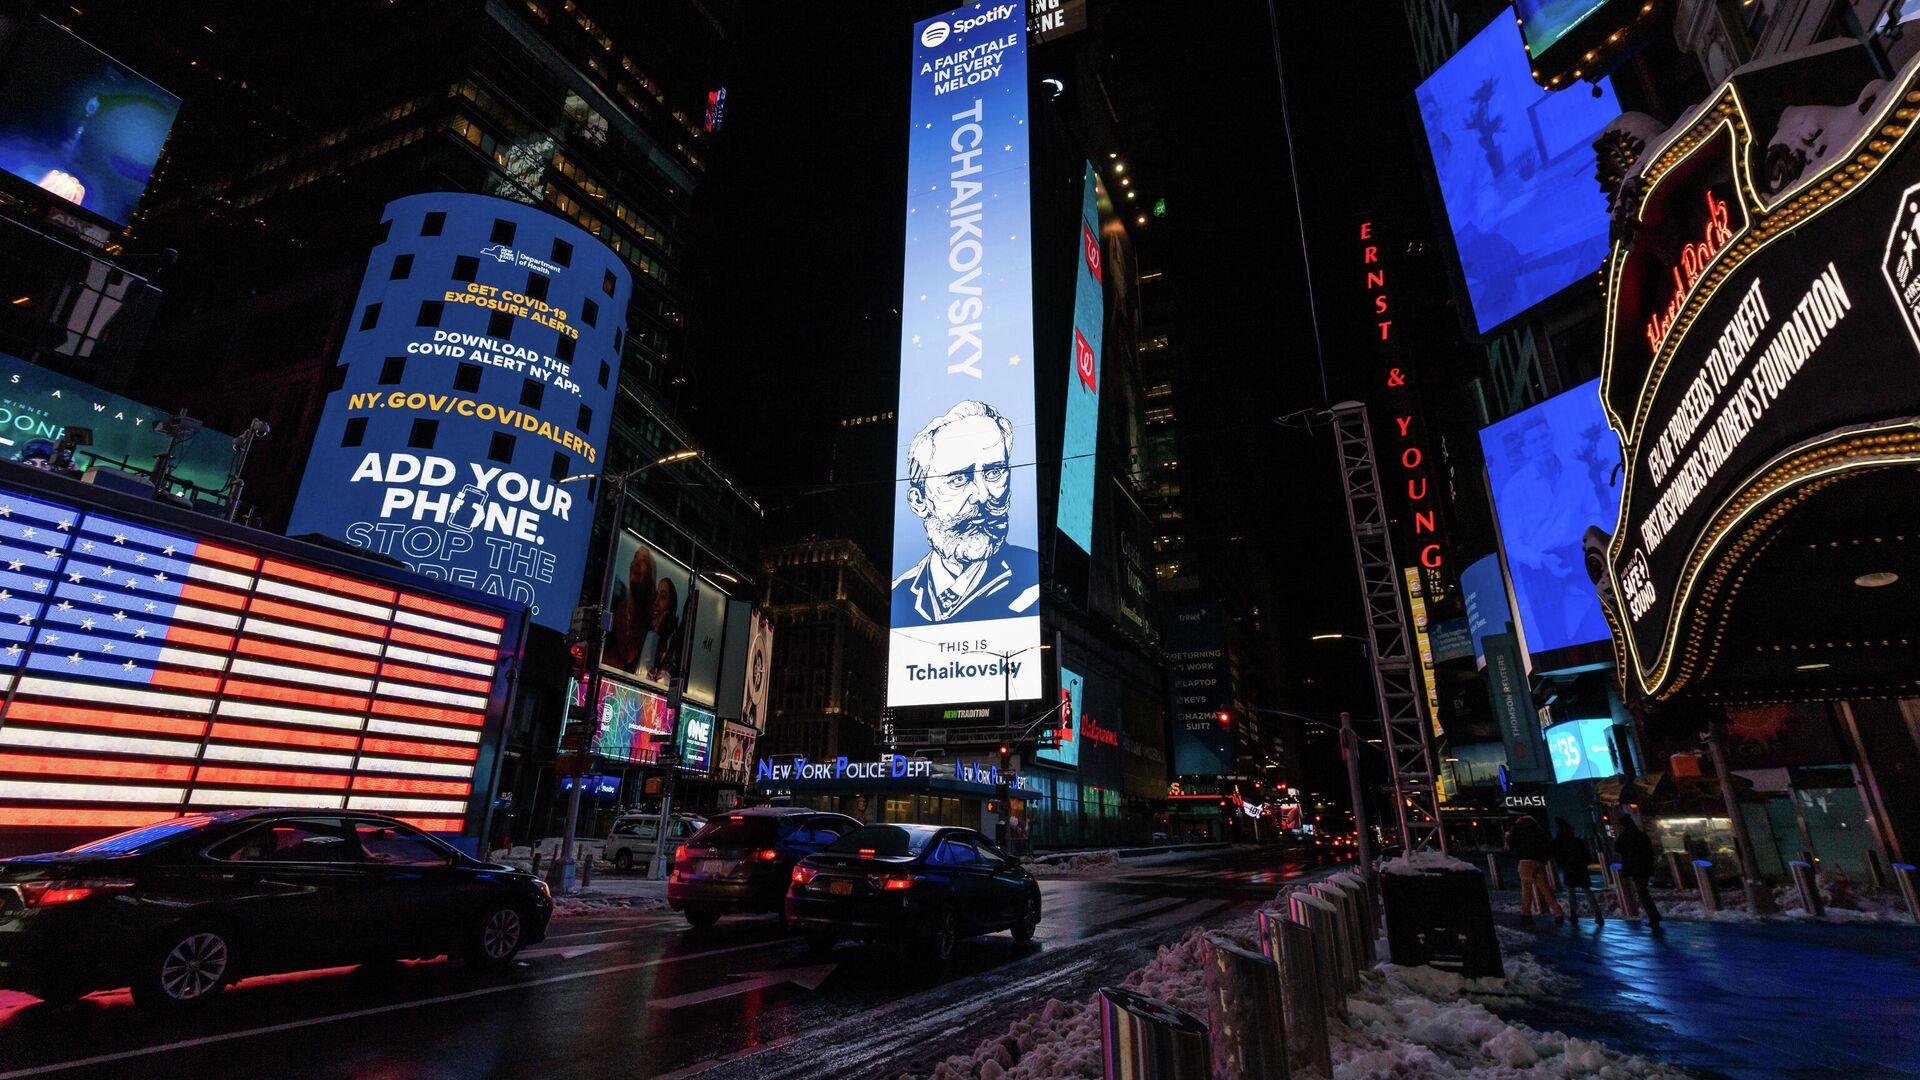 Spotify объяснил, почему на Таймс-сквер появился билборд с Чайковским